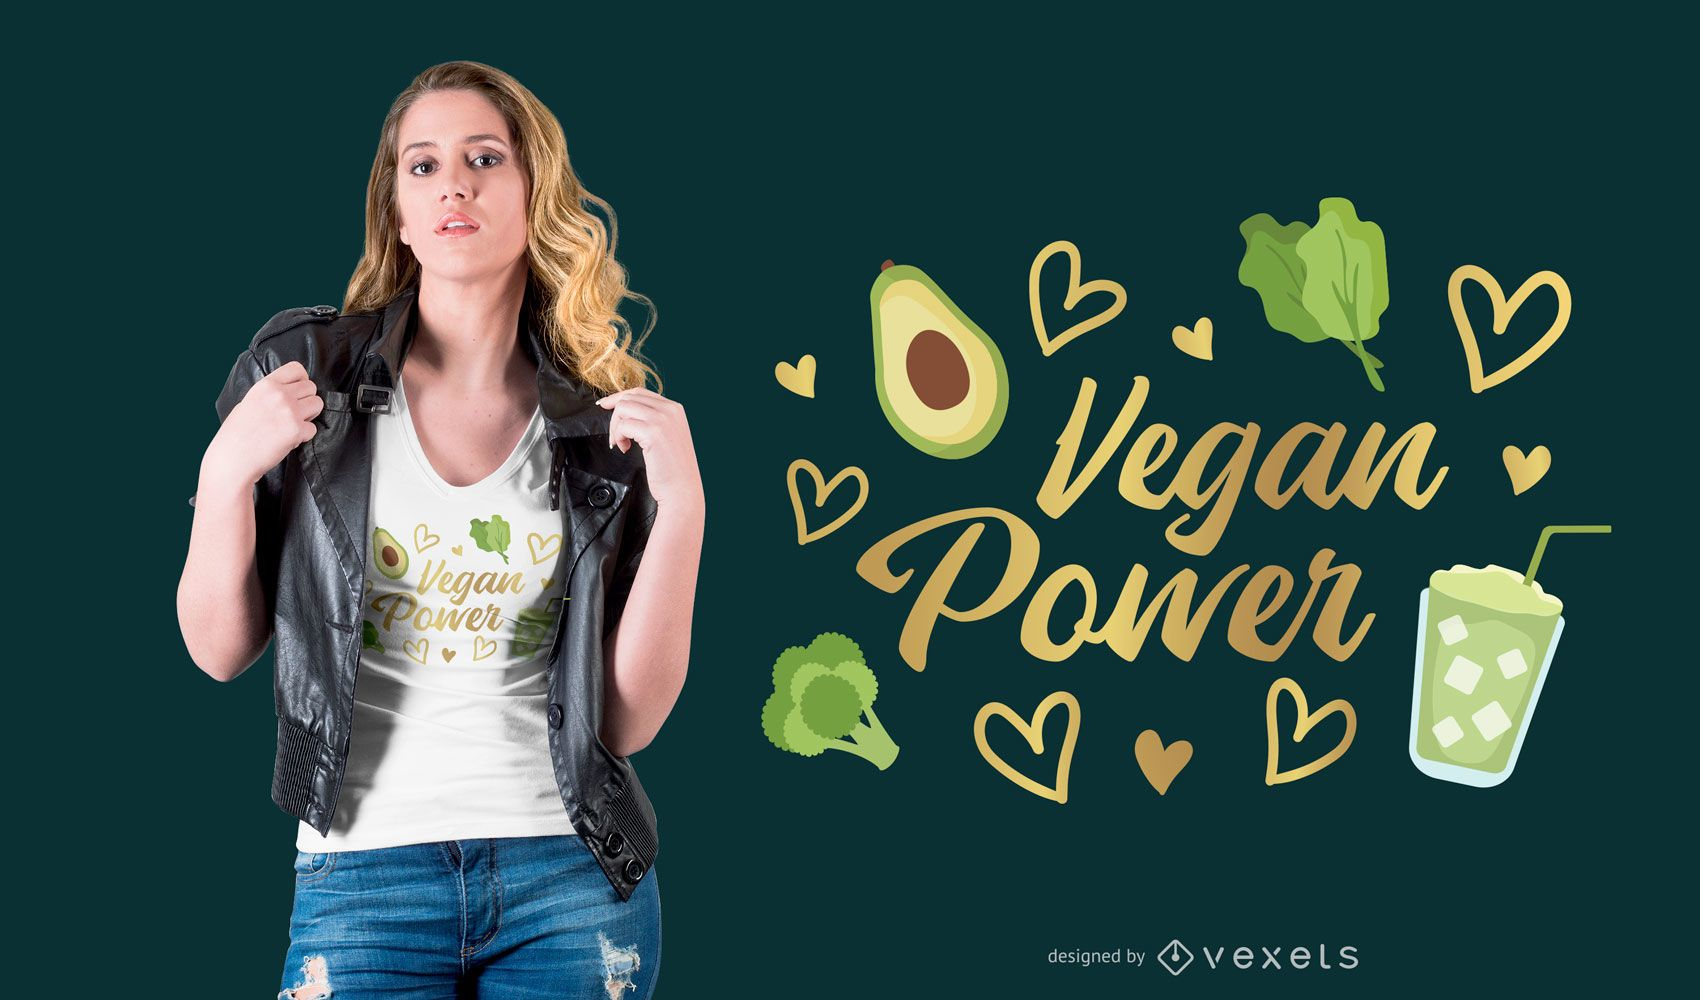 Vegan power t-shirt design